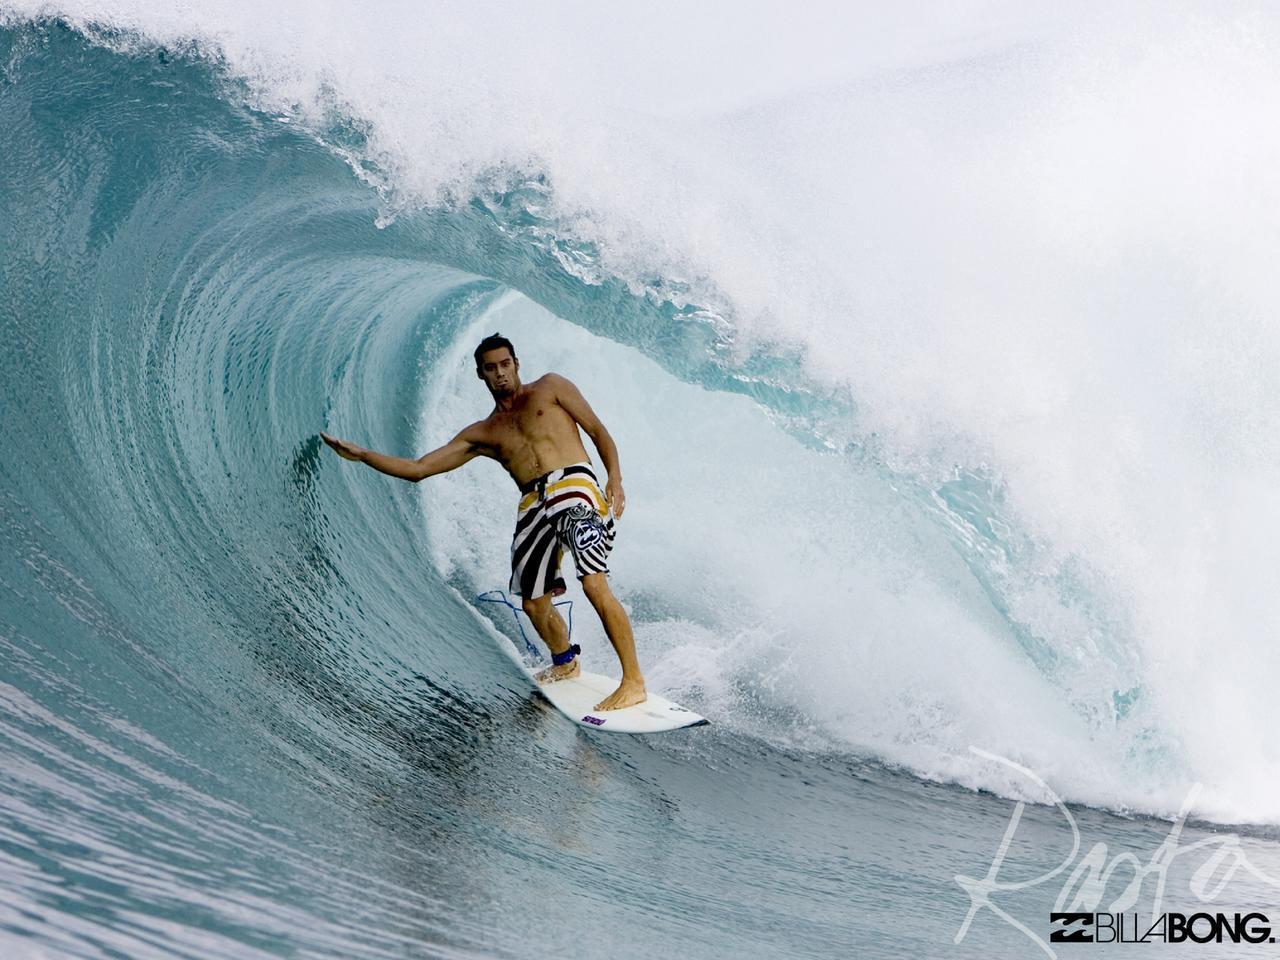 Billabong Surfing Wallpaper Wallpapersafari